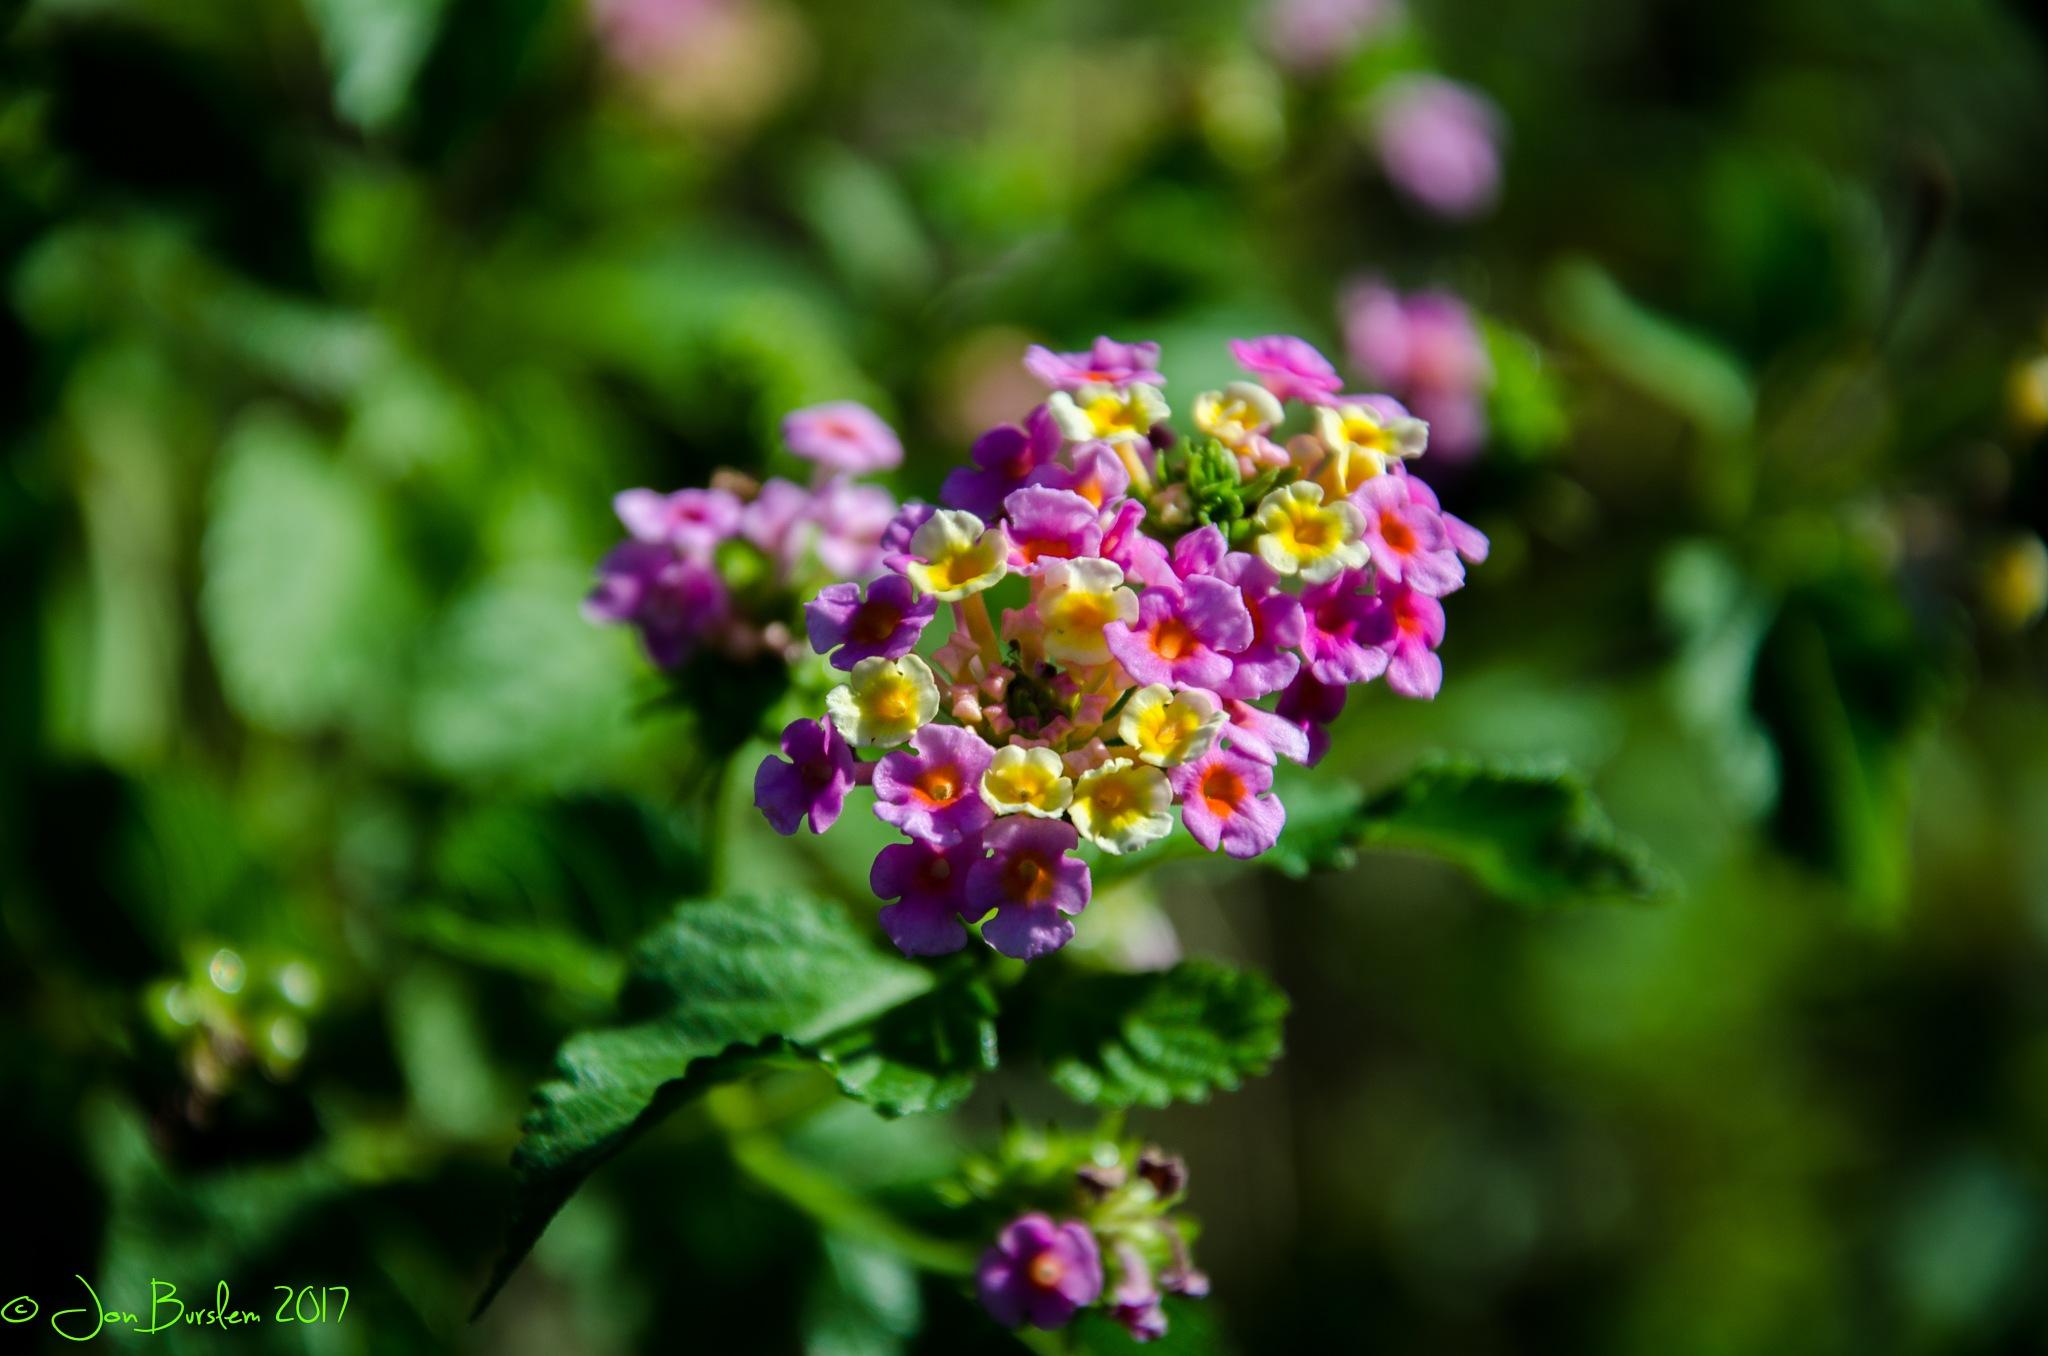 Flower by Jon Burslem